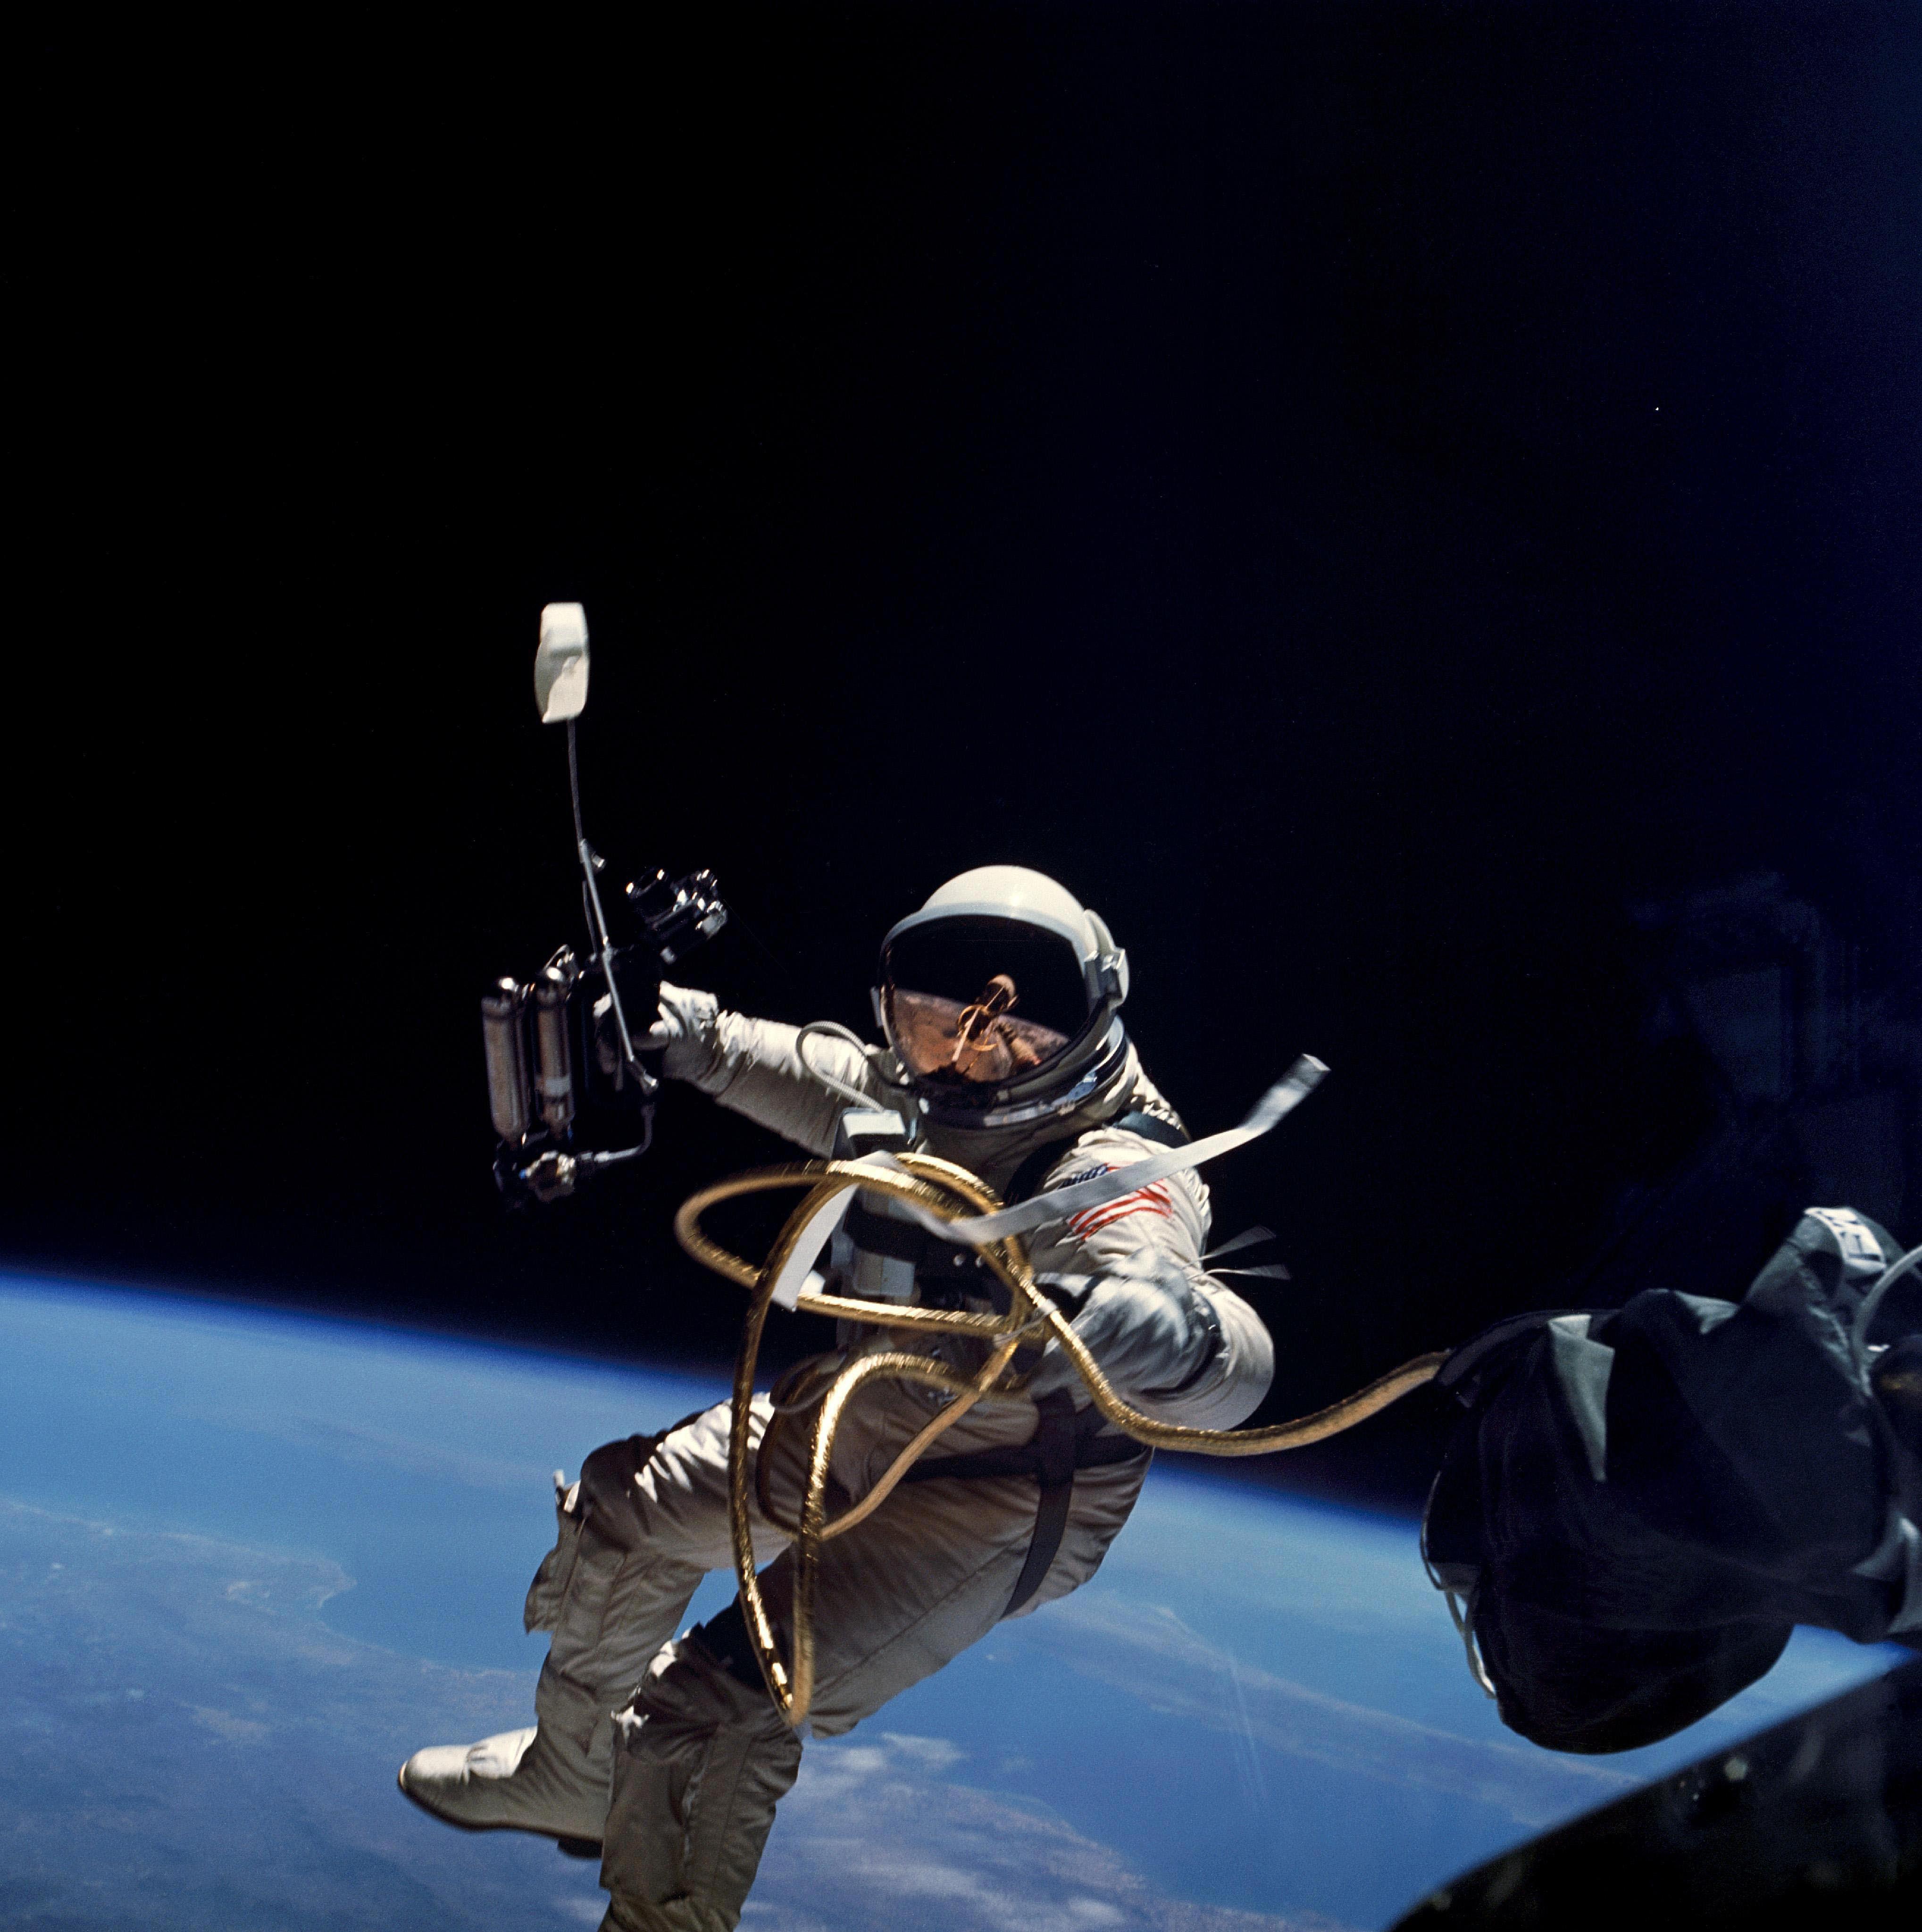 Astronaut Edward White during first EVA performed during Gemini 4 flight